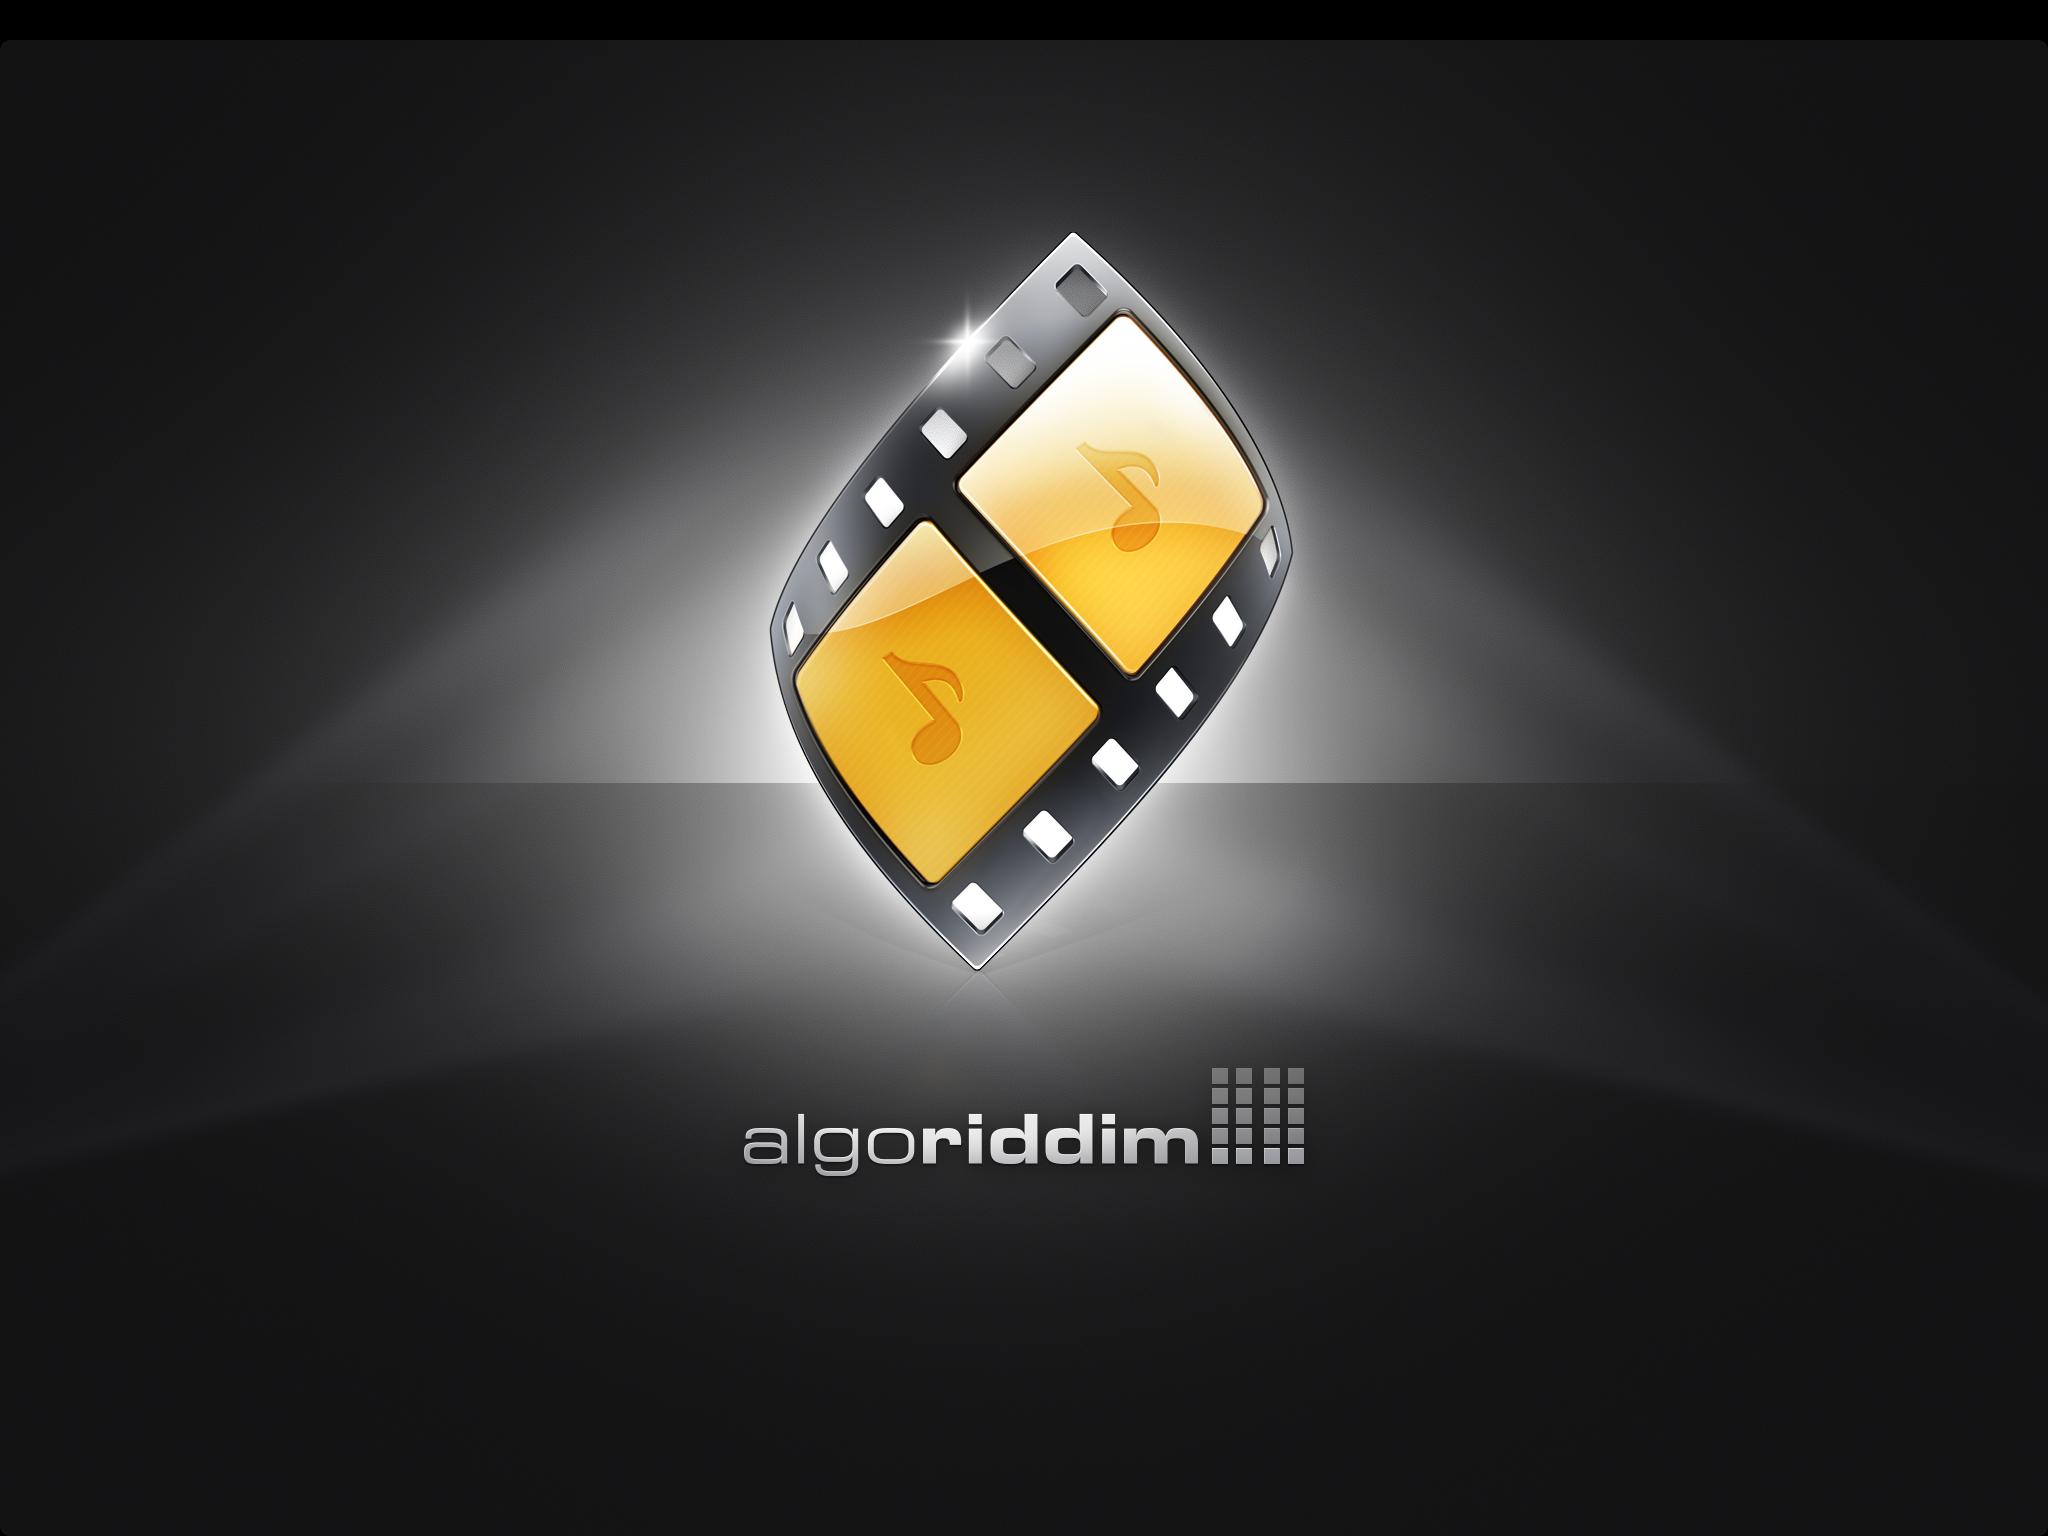 Algoriddim's vjay app